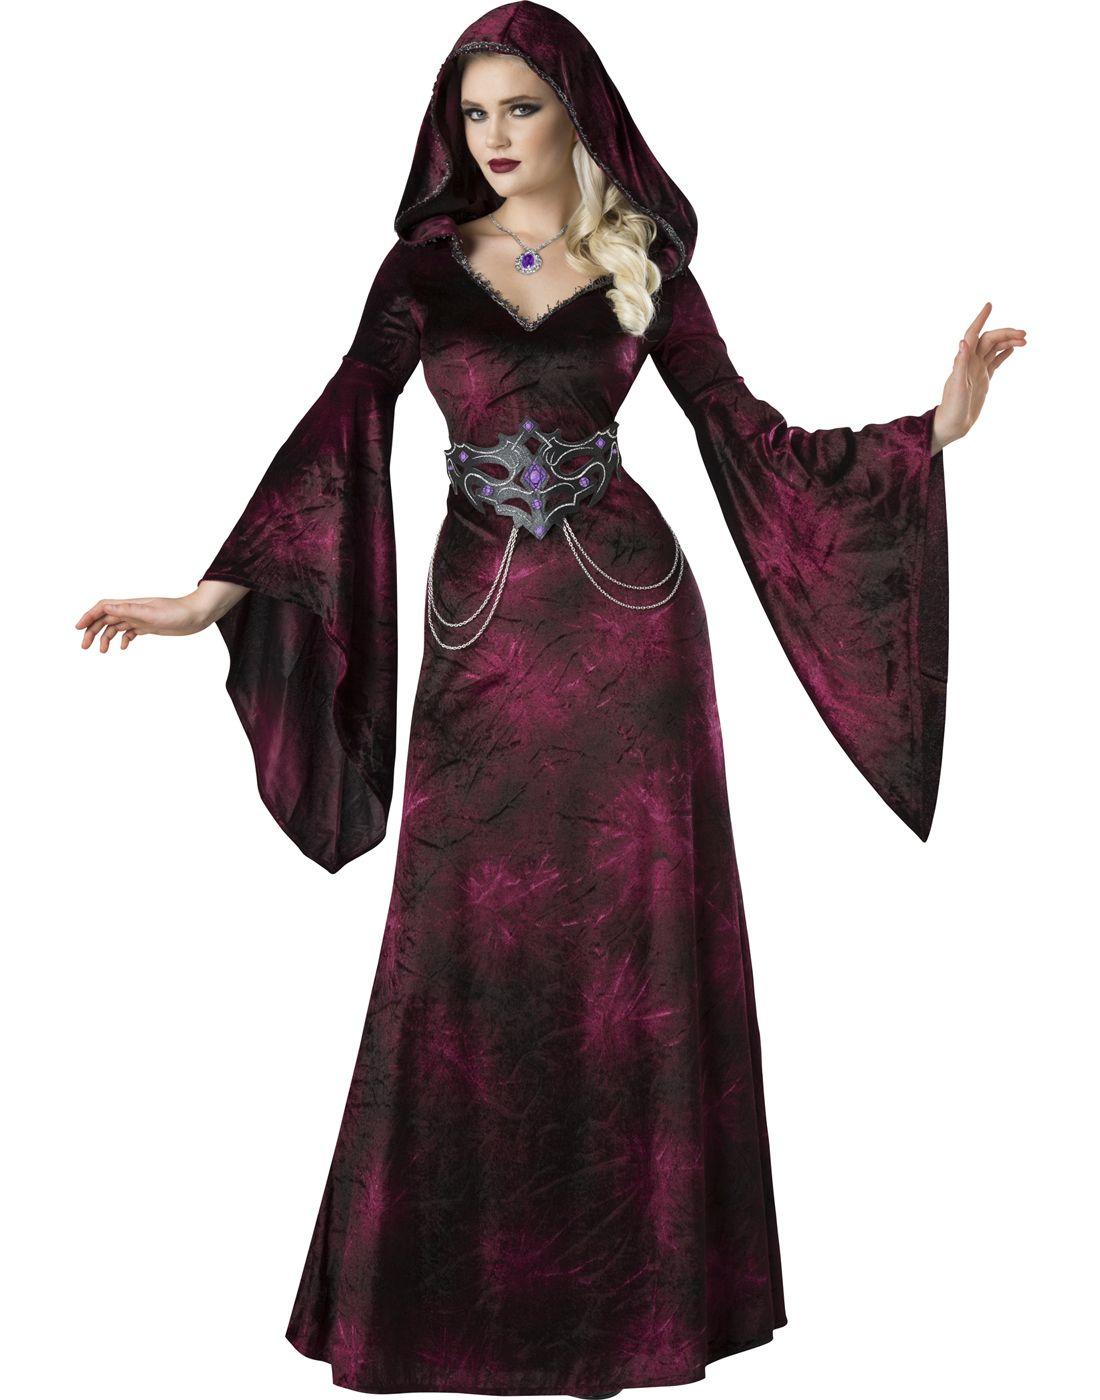 Pin on Adult fantasy fairy costume